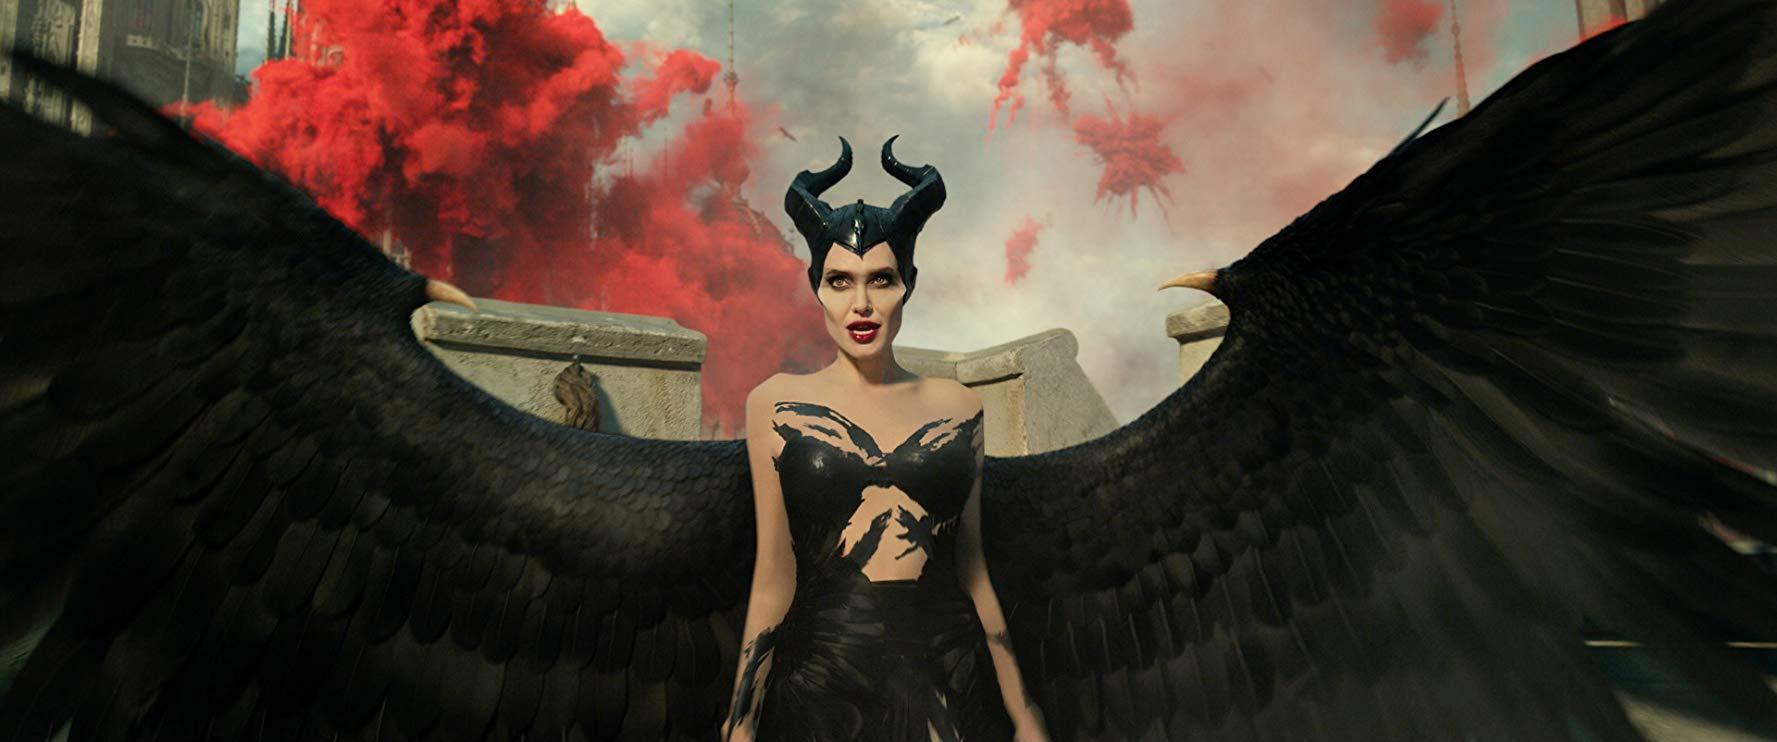 Maleficent Mistress Of Evil Imax Film Review Blazing Minds